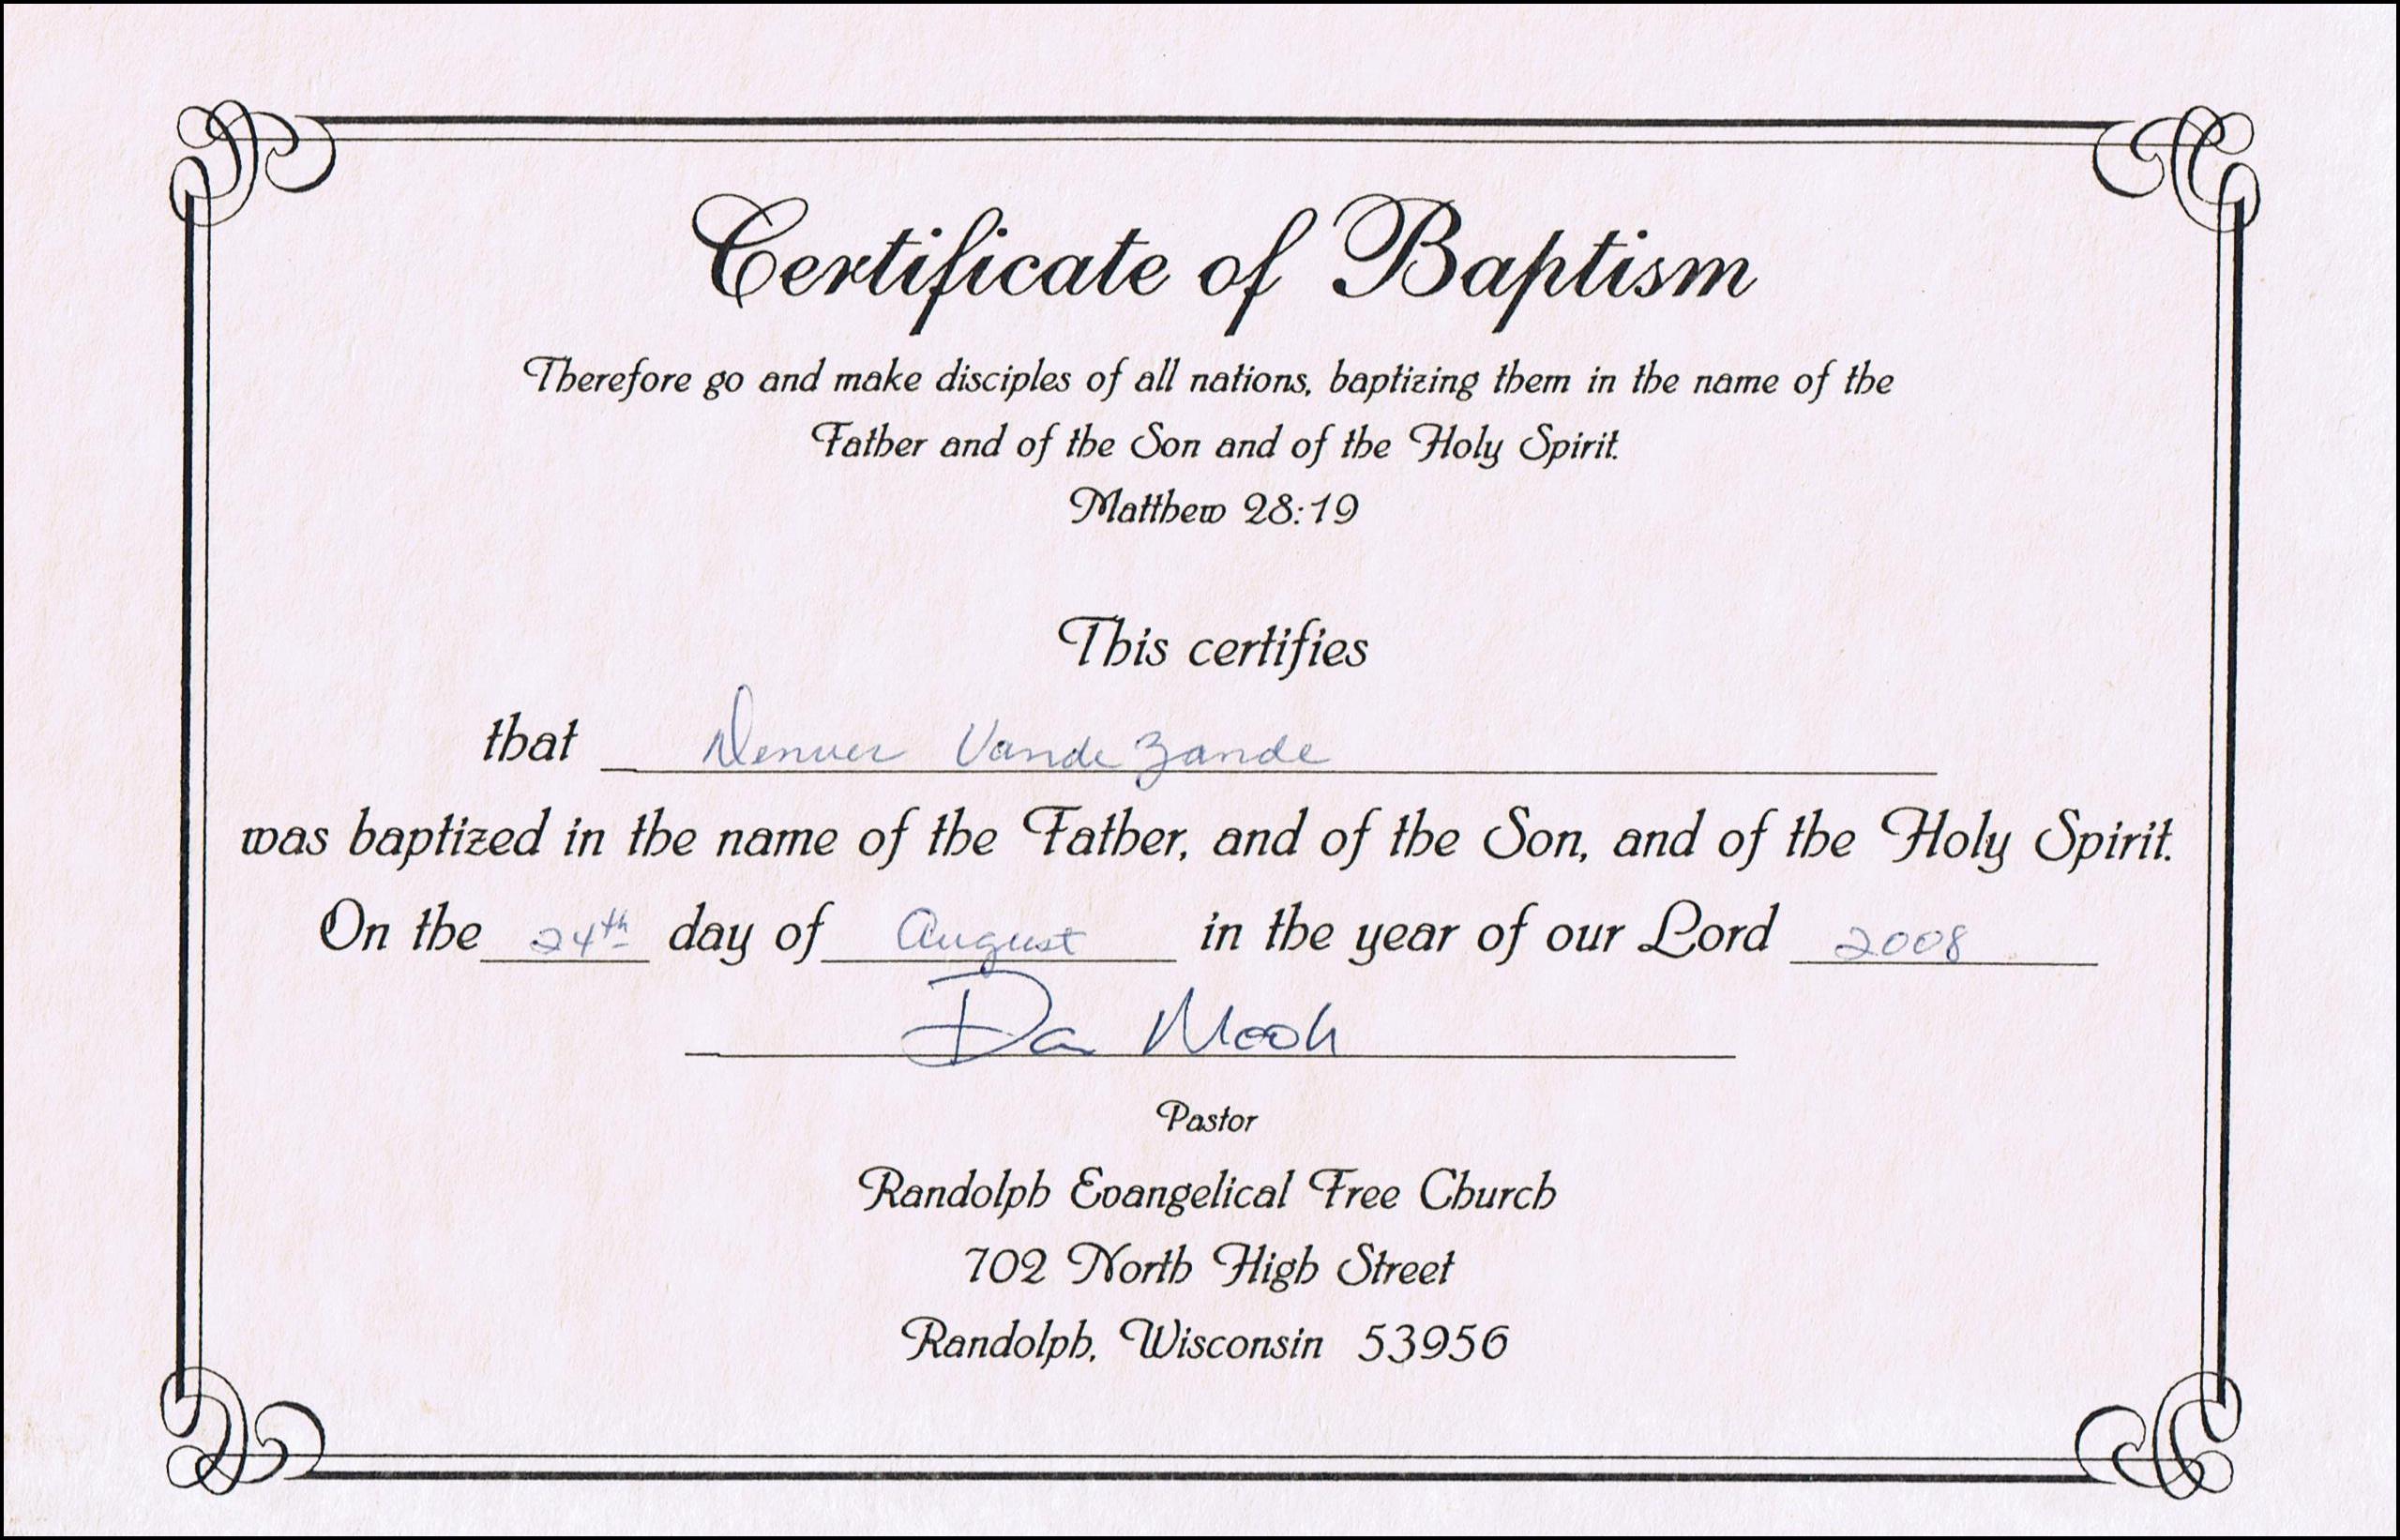 Printable Baptism Certificate - Kaza.psstech.co - Free Online Printable Baptism Certificates